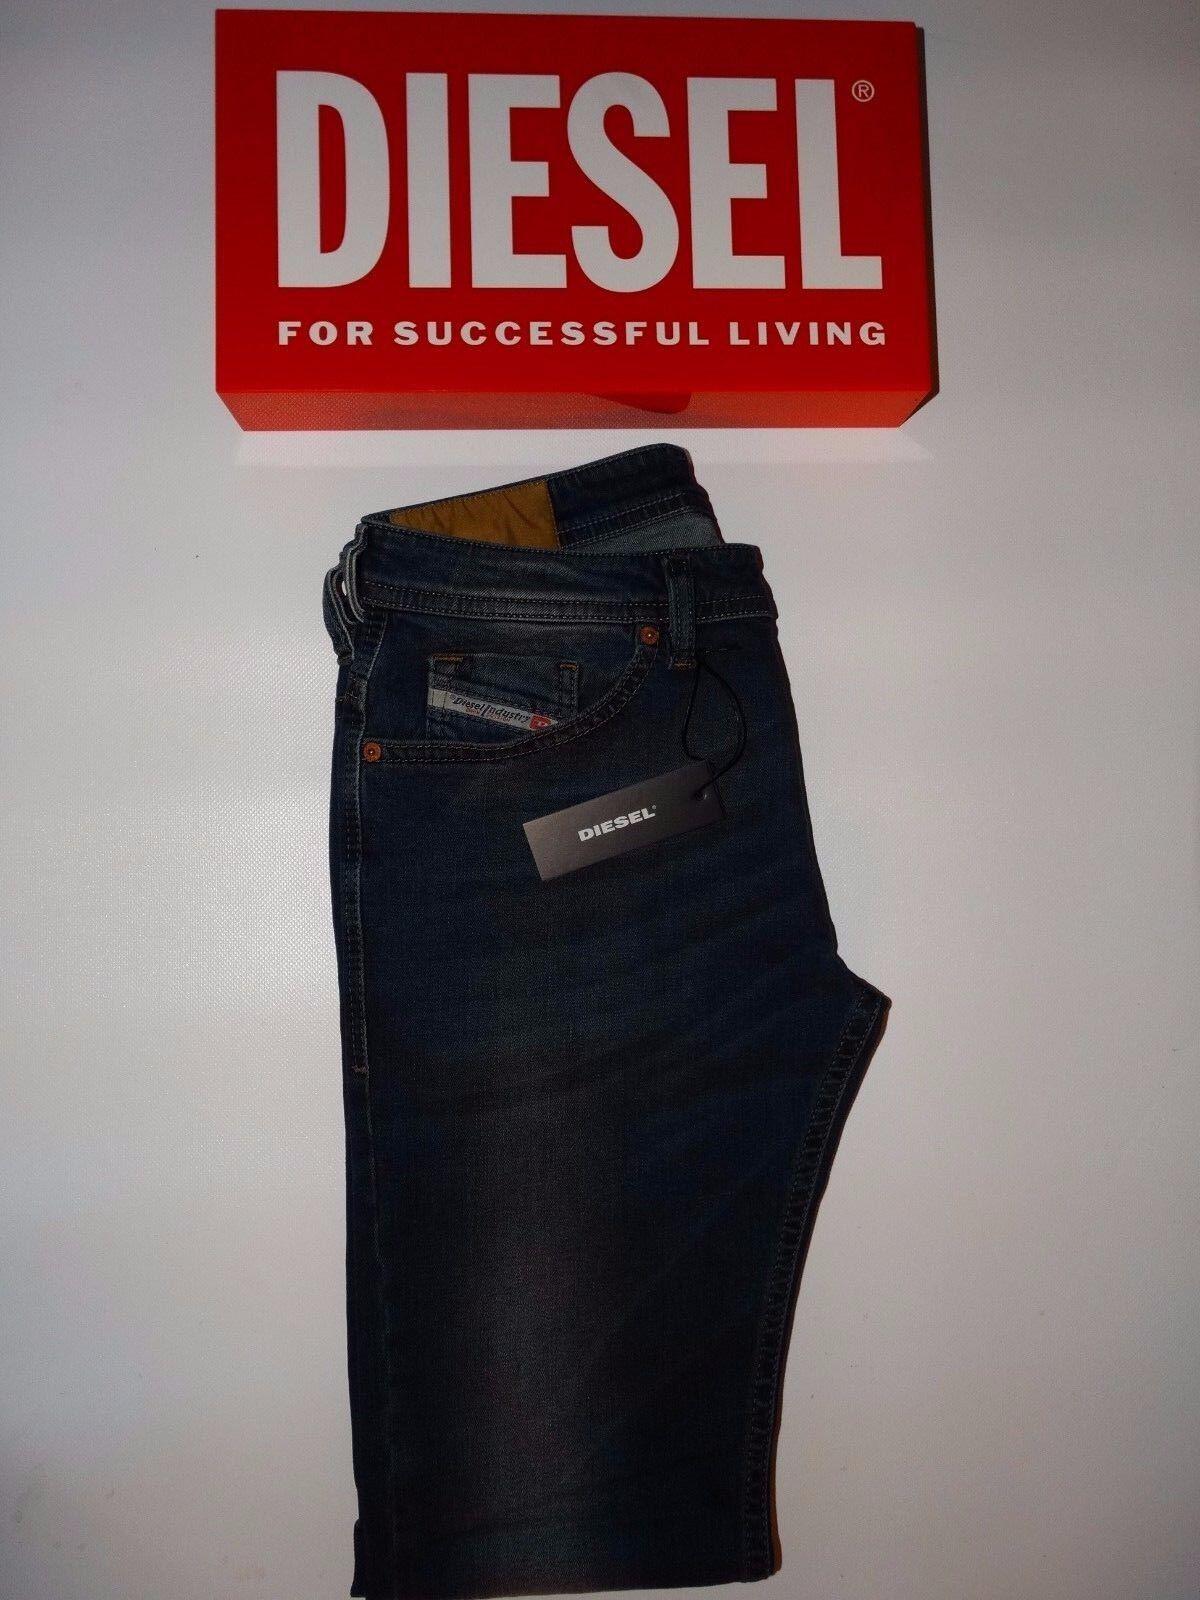 DIESEL Jeans-thommer-Skinny Fit - 084BU (STRETCH) - Nuovo con Etichetta